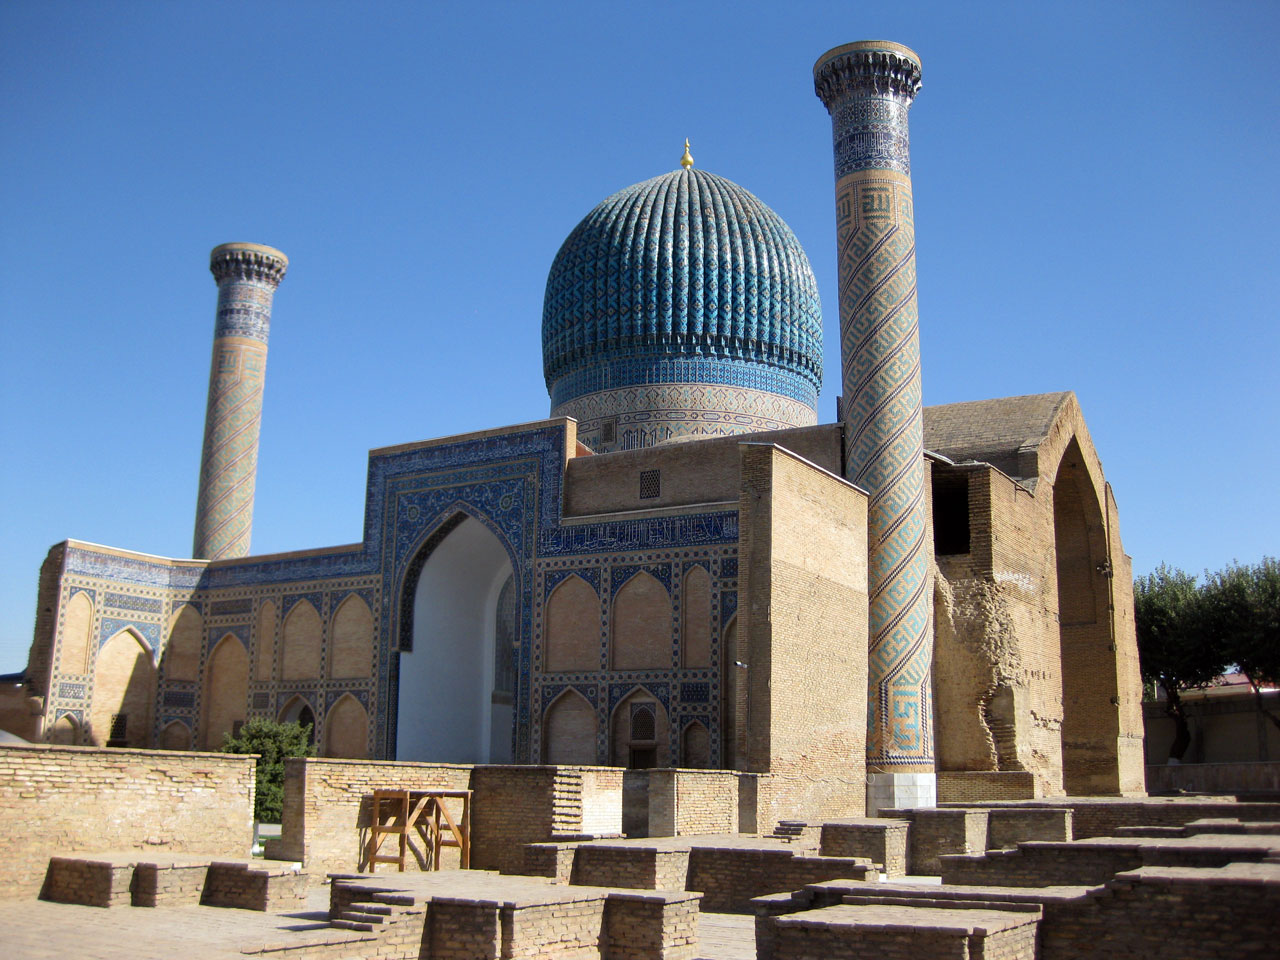 Gur-e-Amir mausoleum, Samarkand